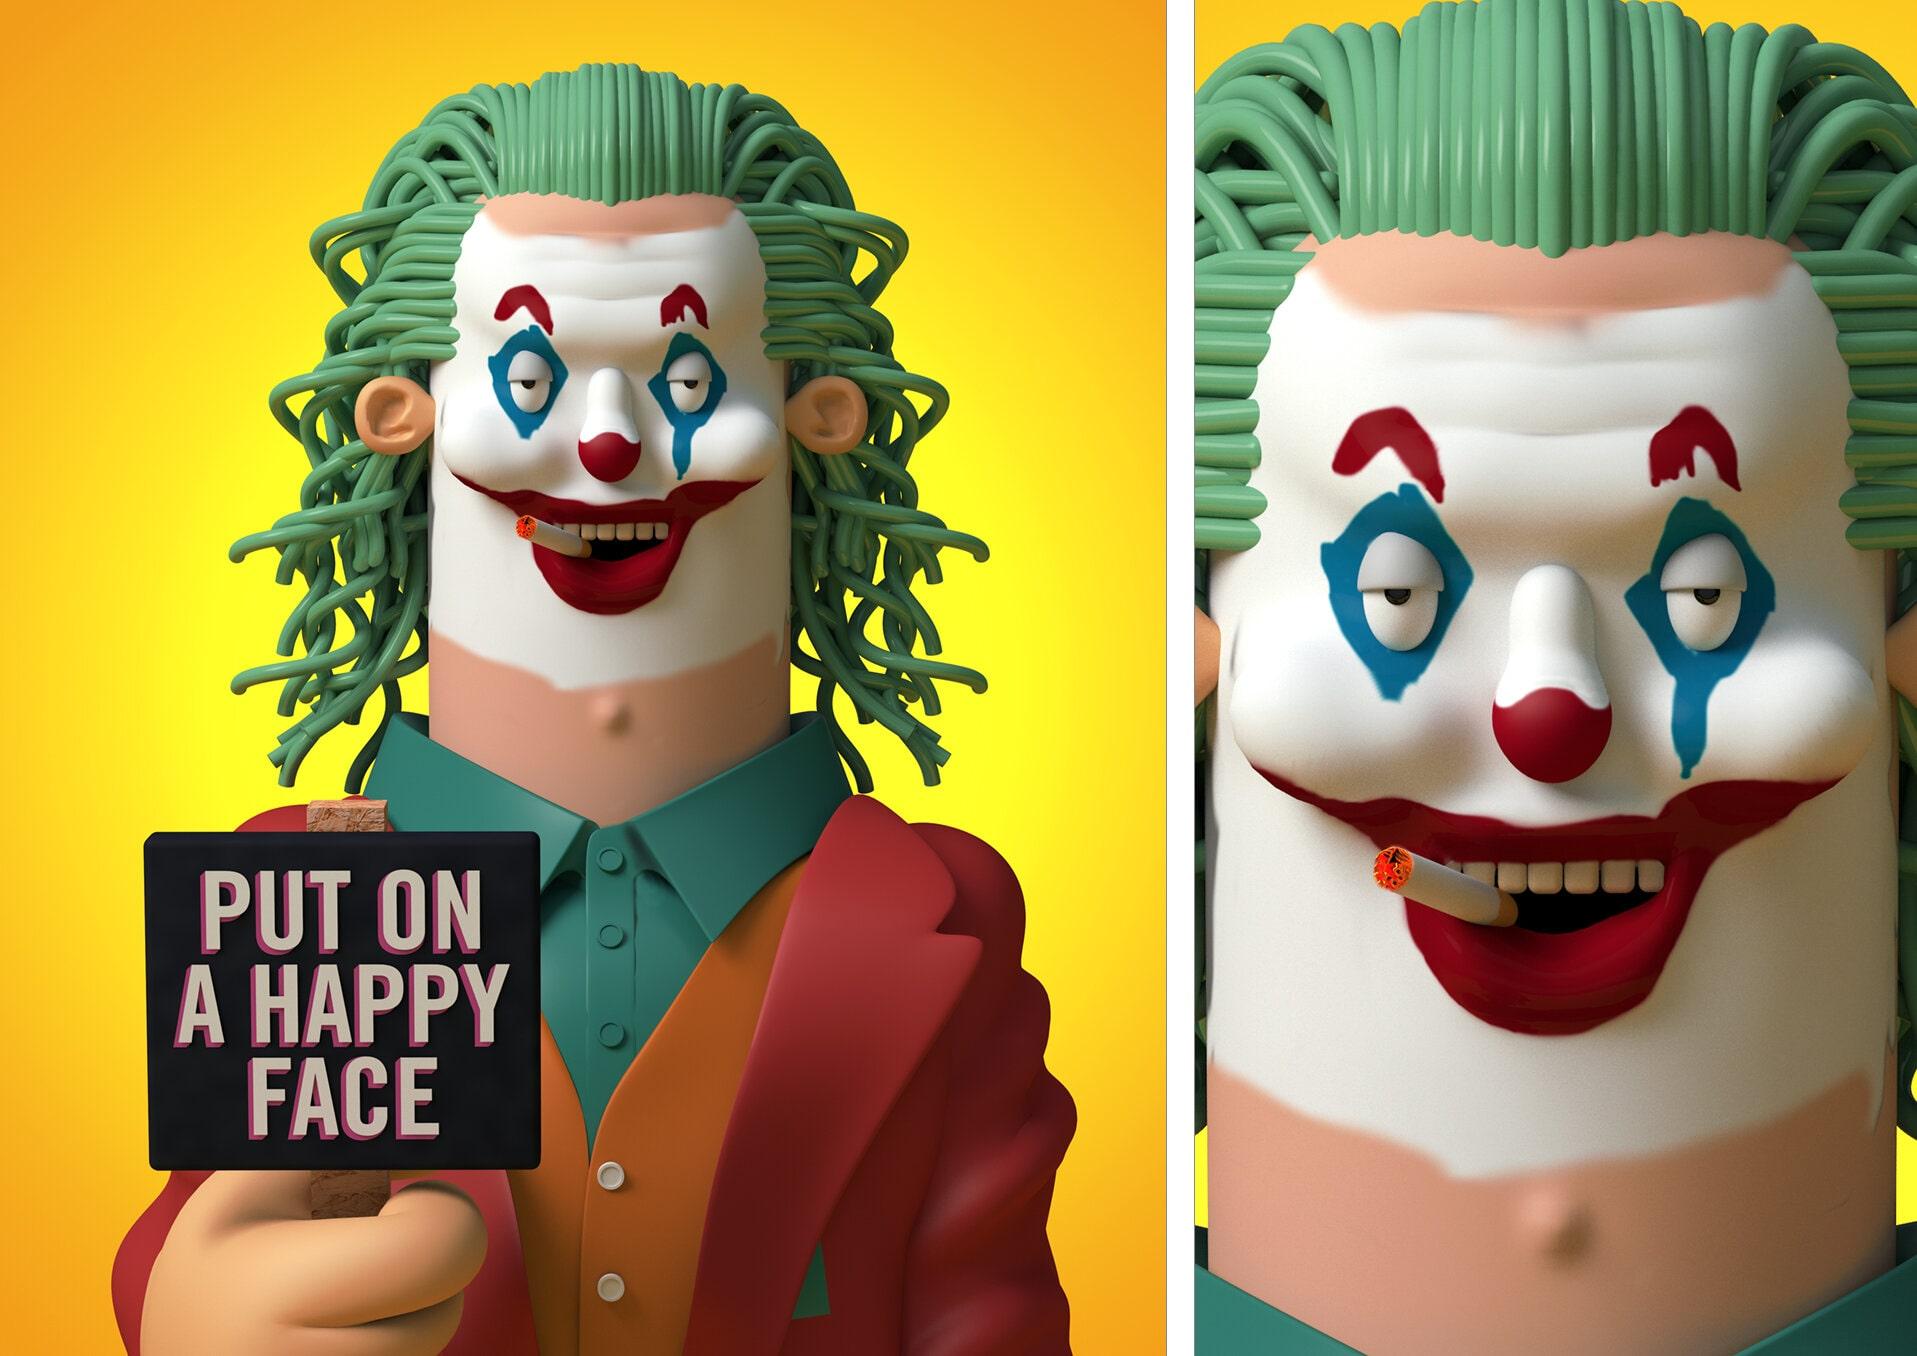 joker ilustracao 3d designe